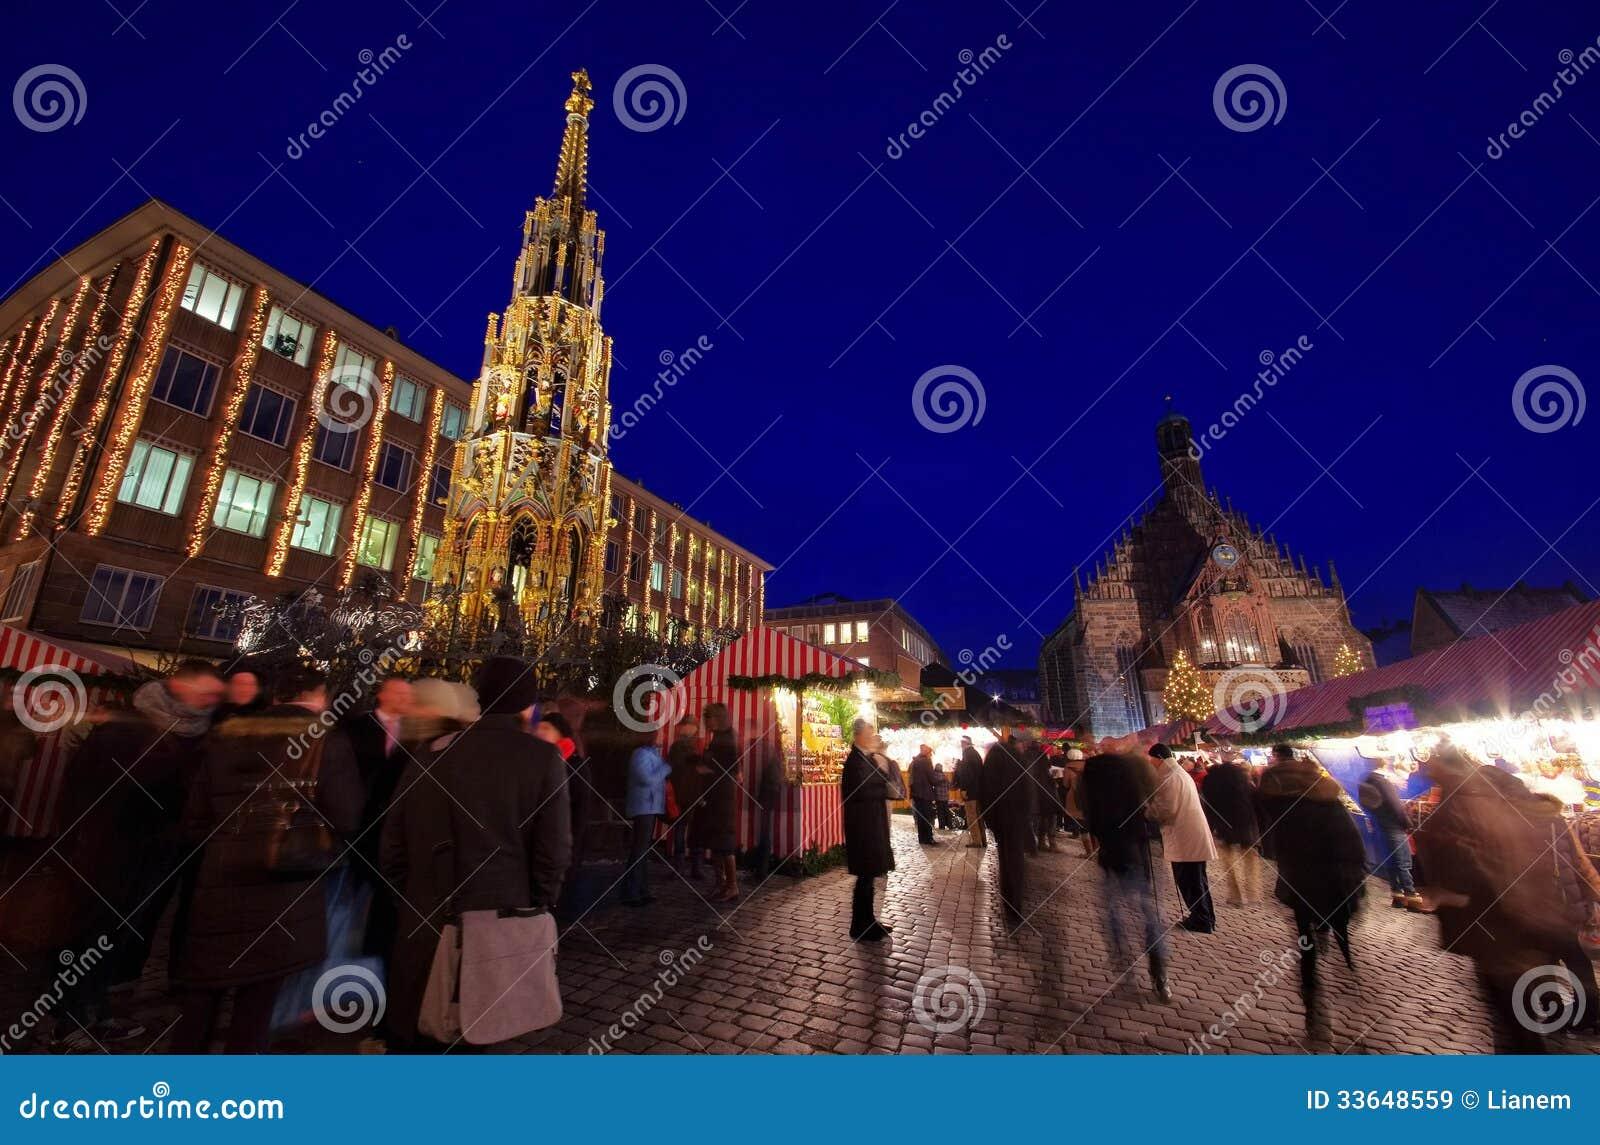 Nuremberg christmas market stock image. Image of town - 33648559